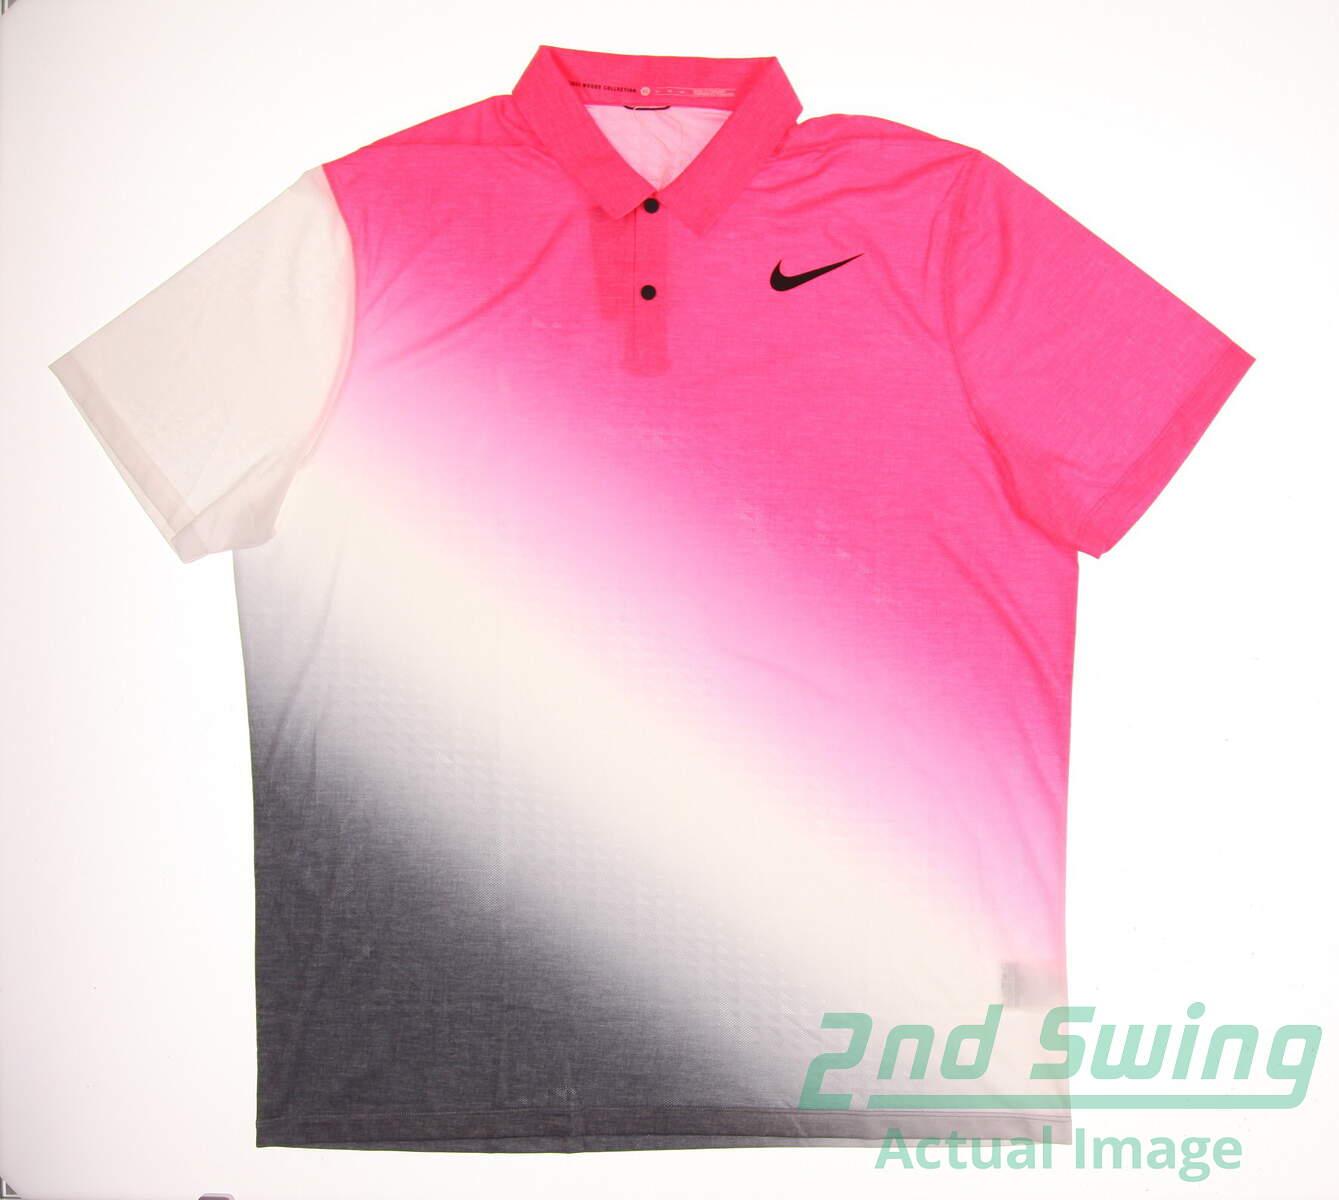 a68c7e2e Tiger Woods Golf Shirts Sale - DREAMWORKS